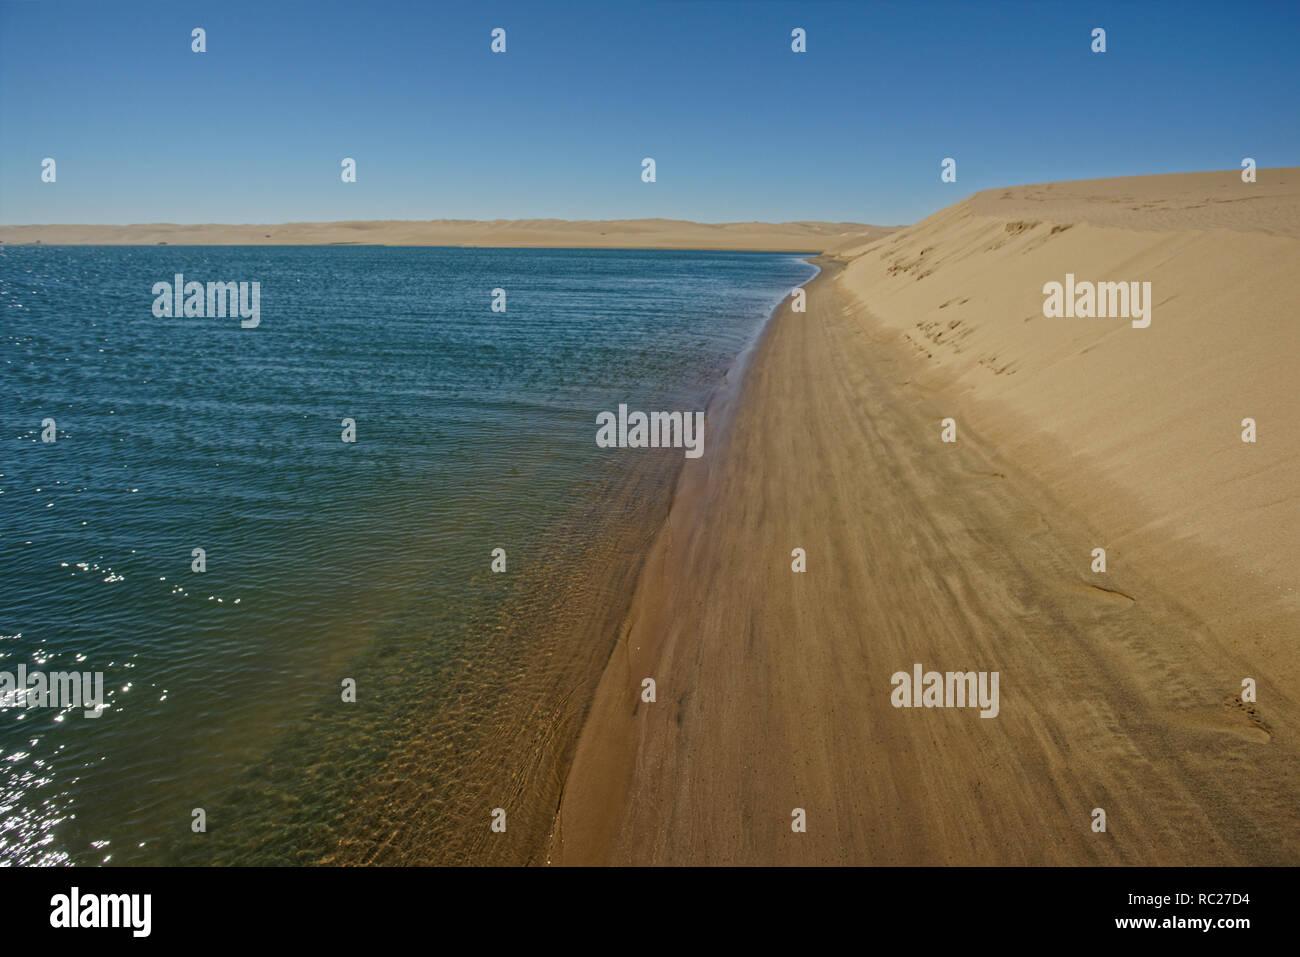 Oceano atlantico incontra il deserto della Skeleton Coast, Namibia, Africa. Foto Stock